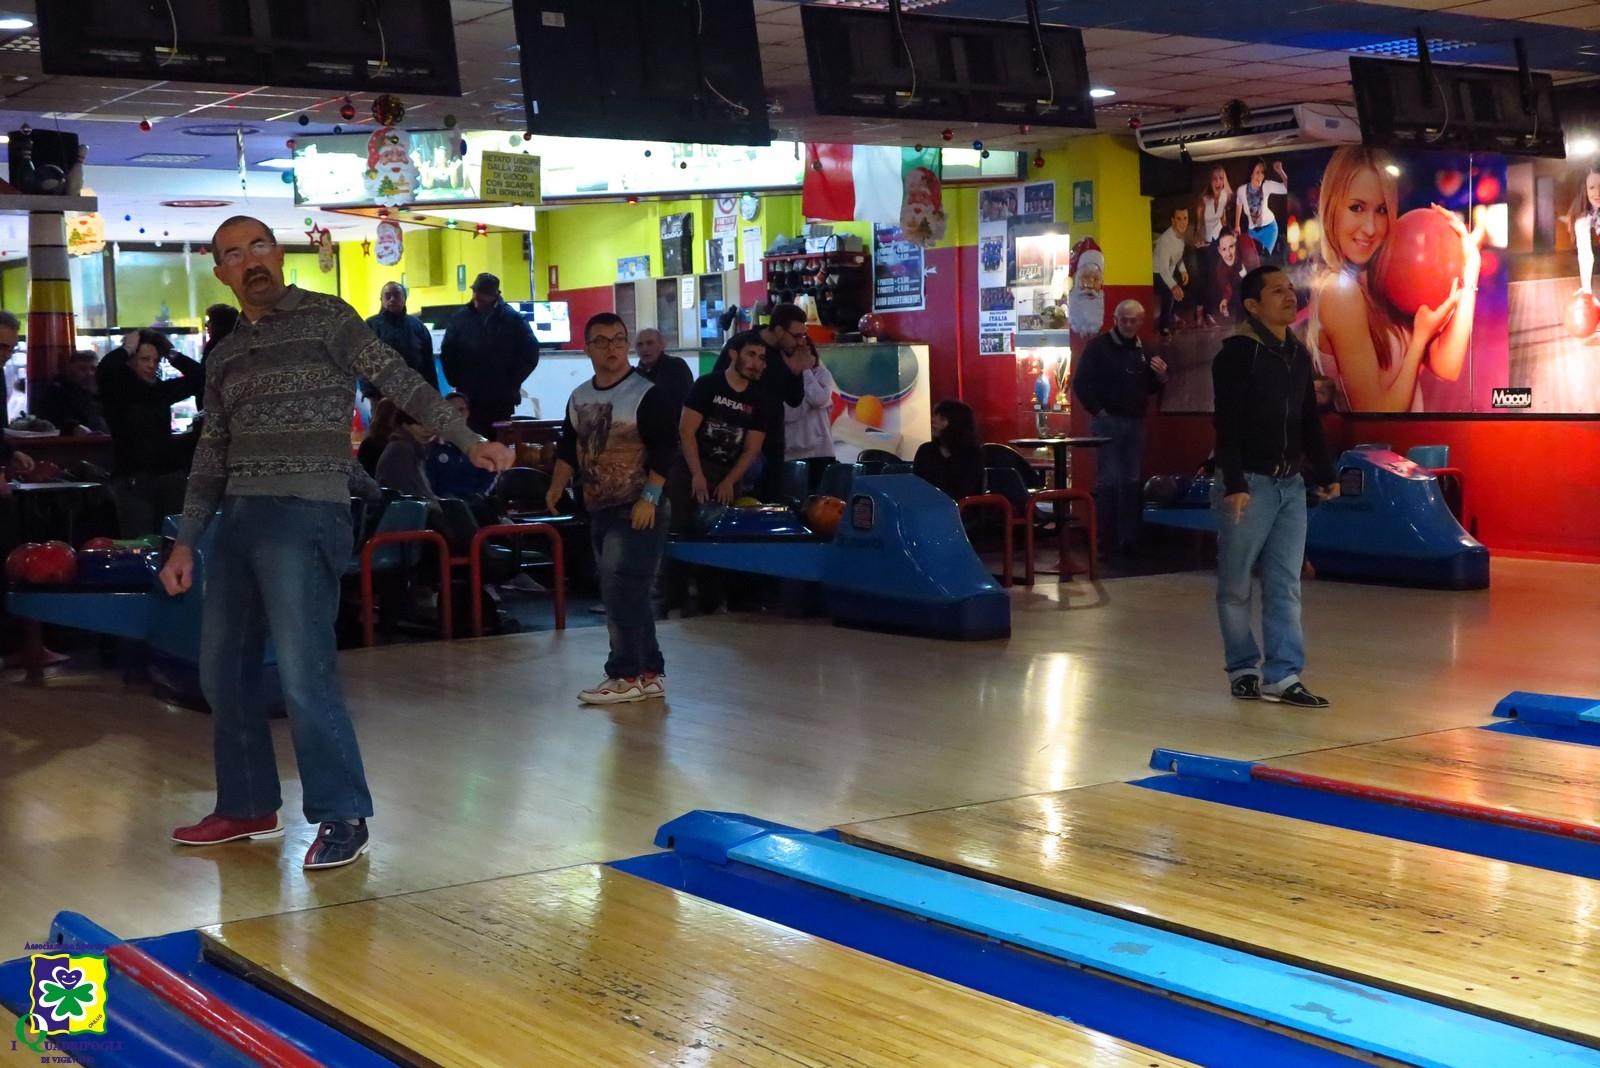 Torneo Bowling Vigevano 19-12-2018 - 055